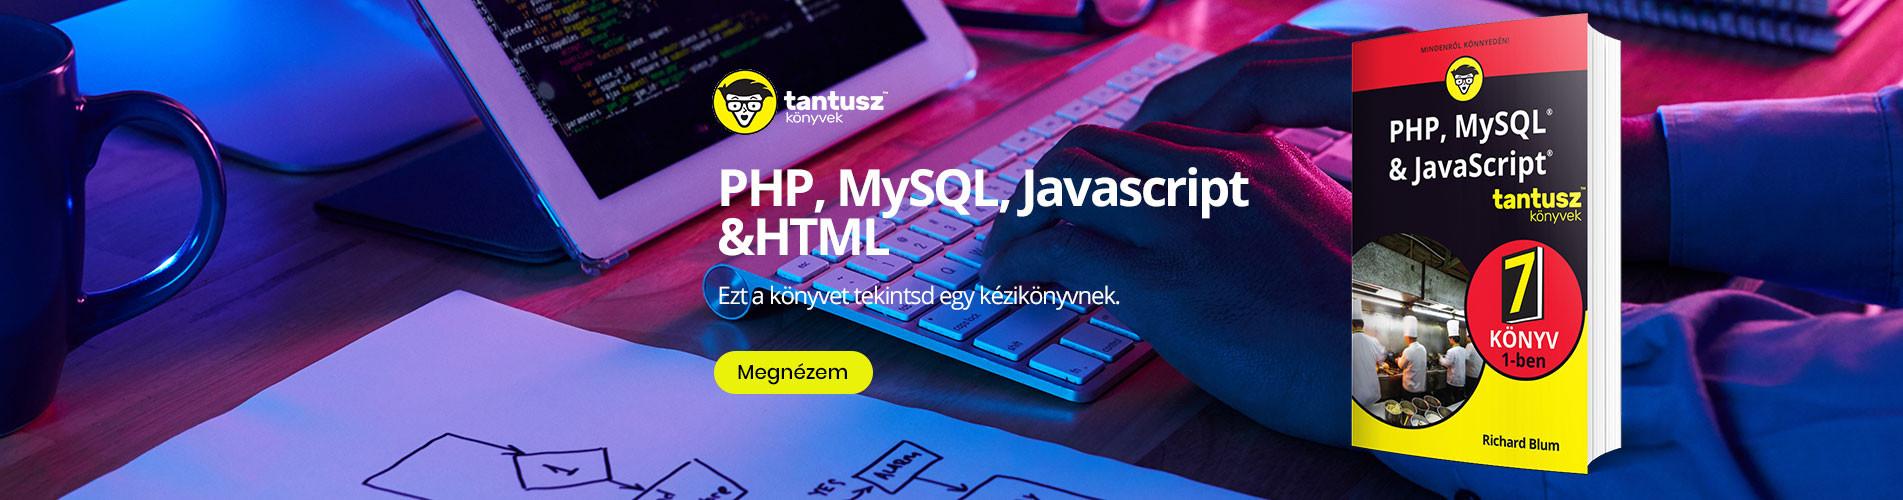 PHP, MySQL, Javascript &HTML